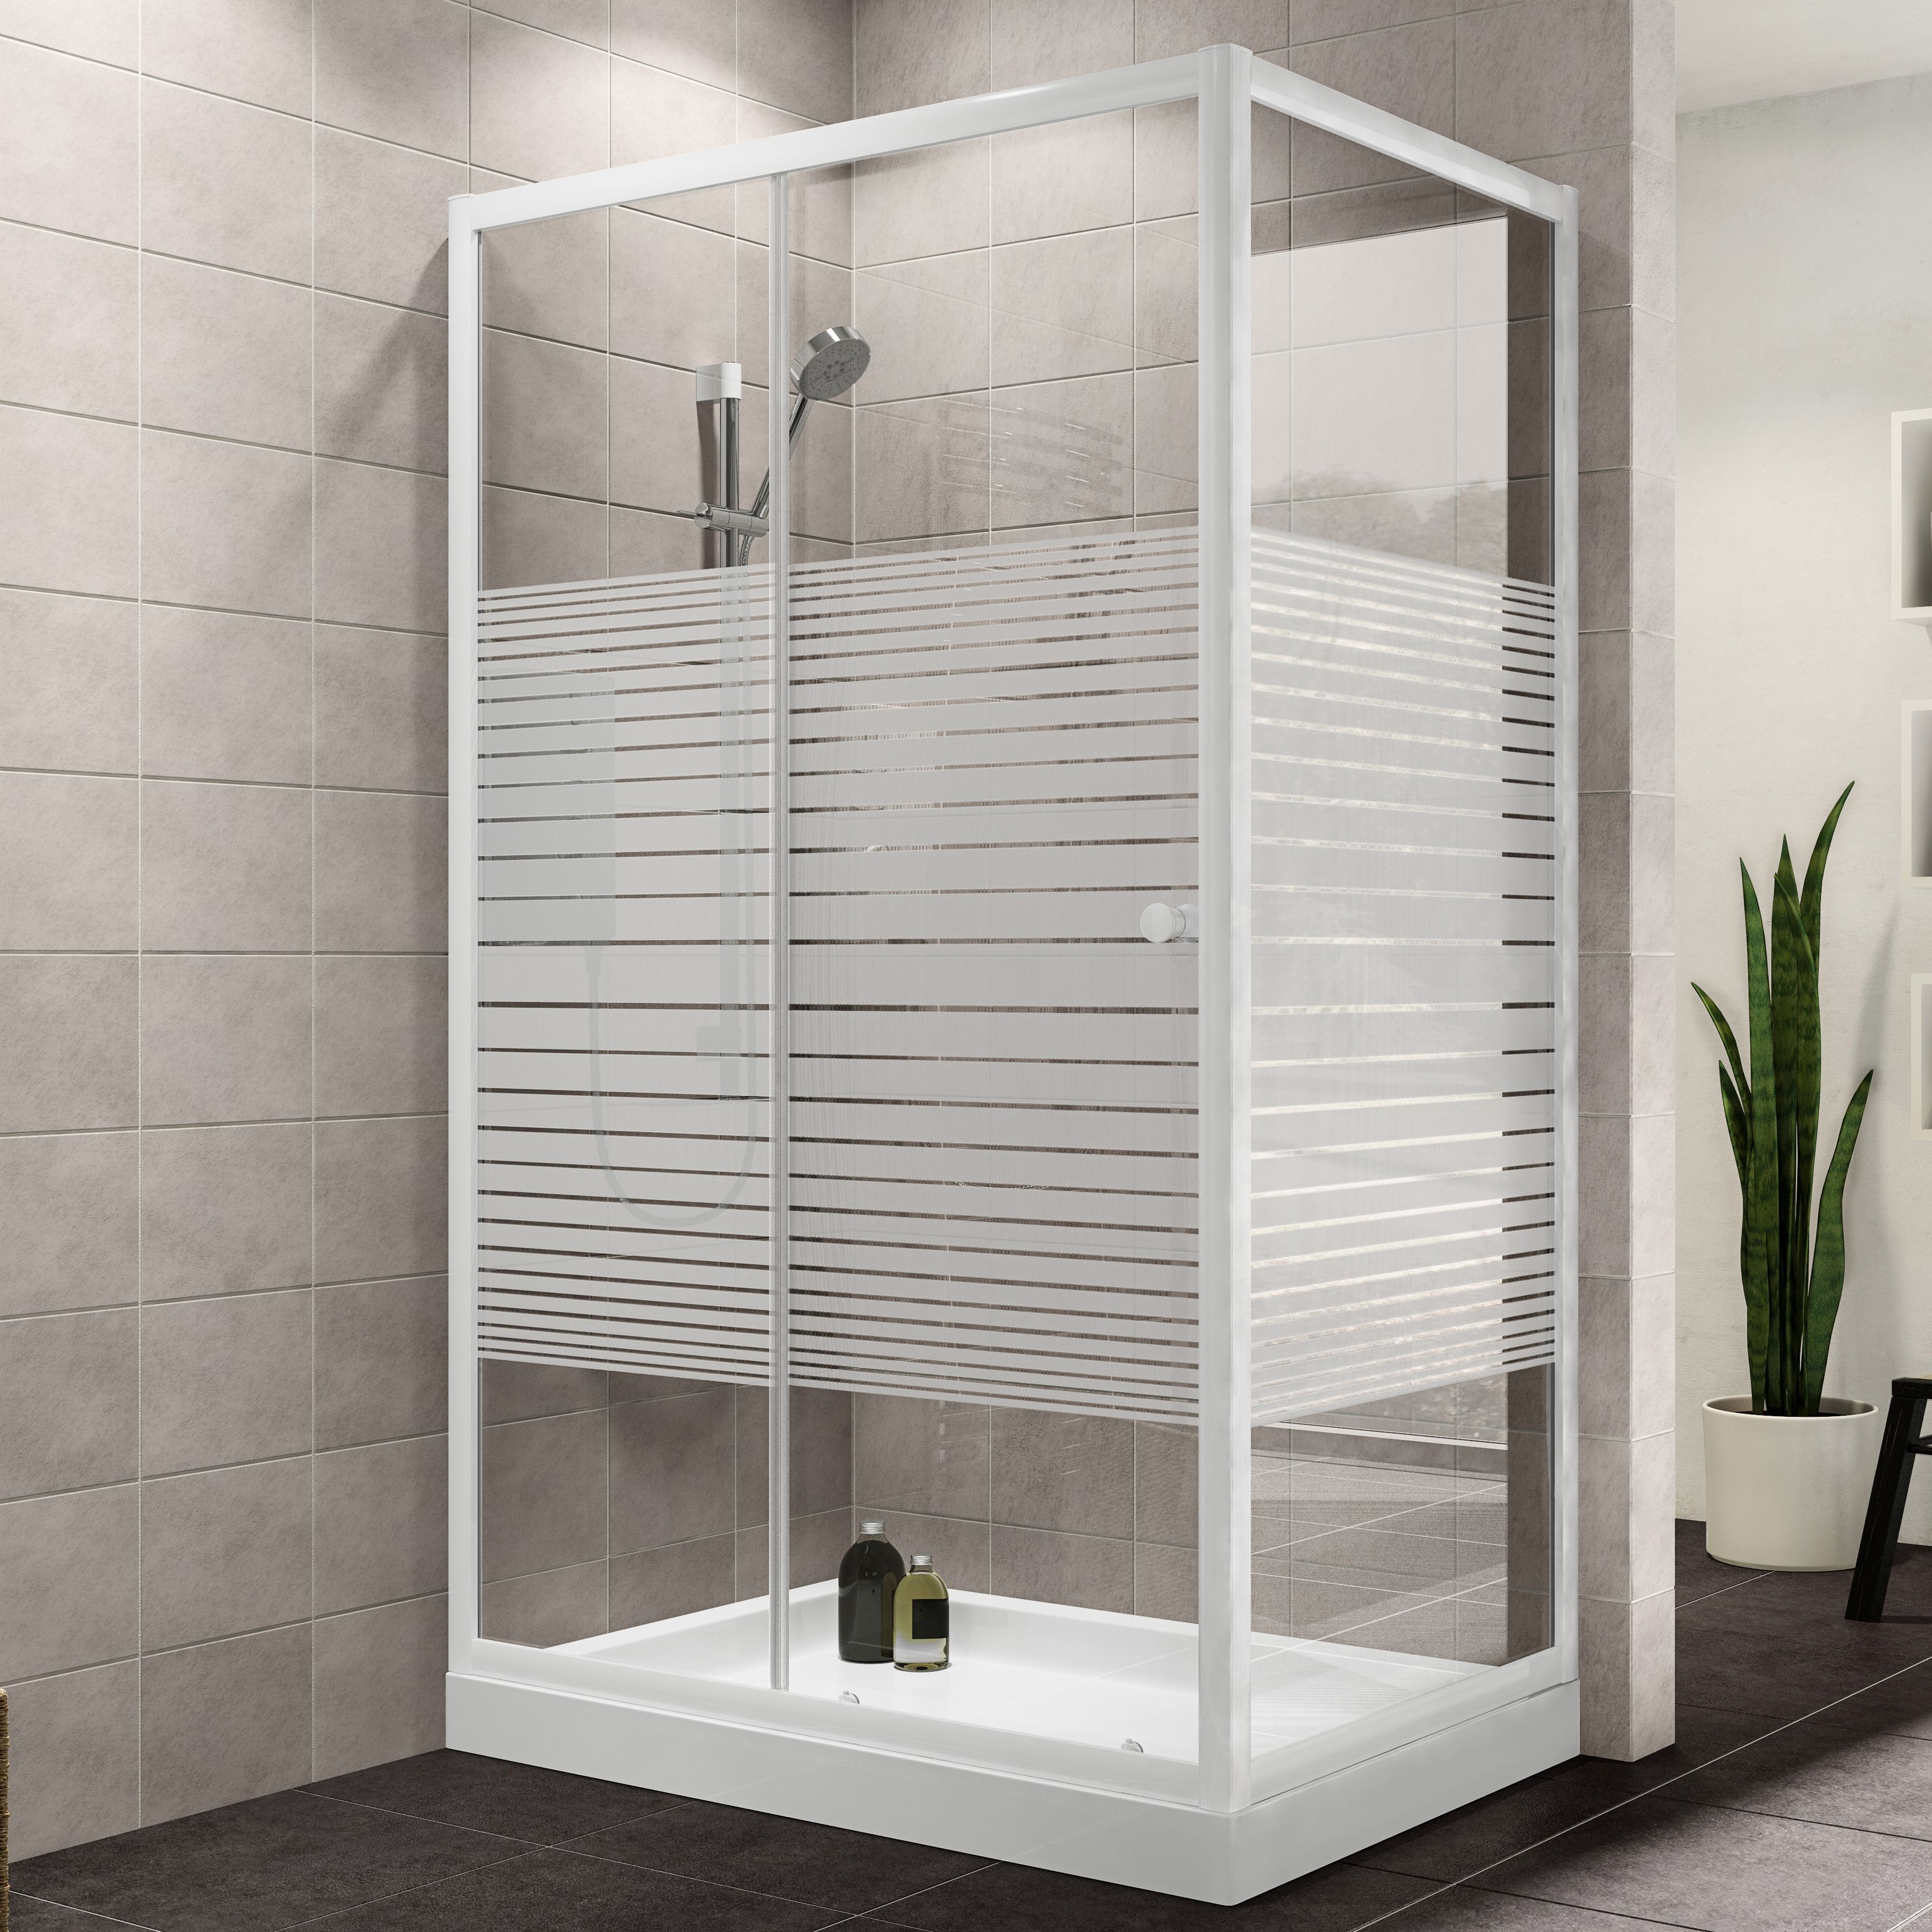 Glass Shower Enclosure Diy